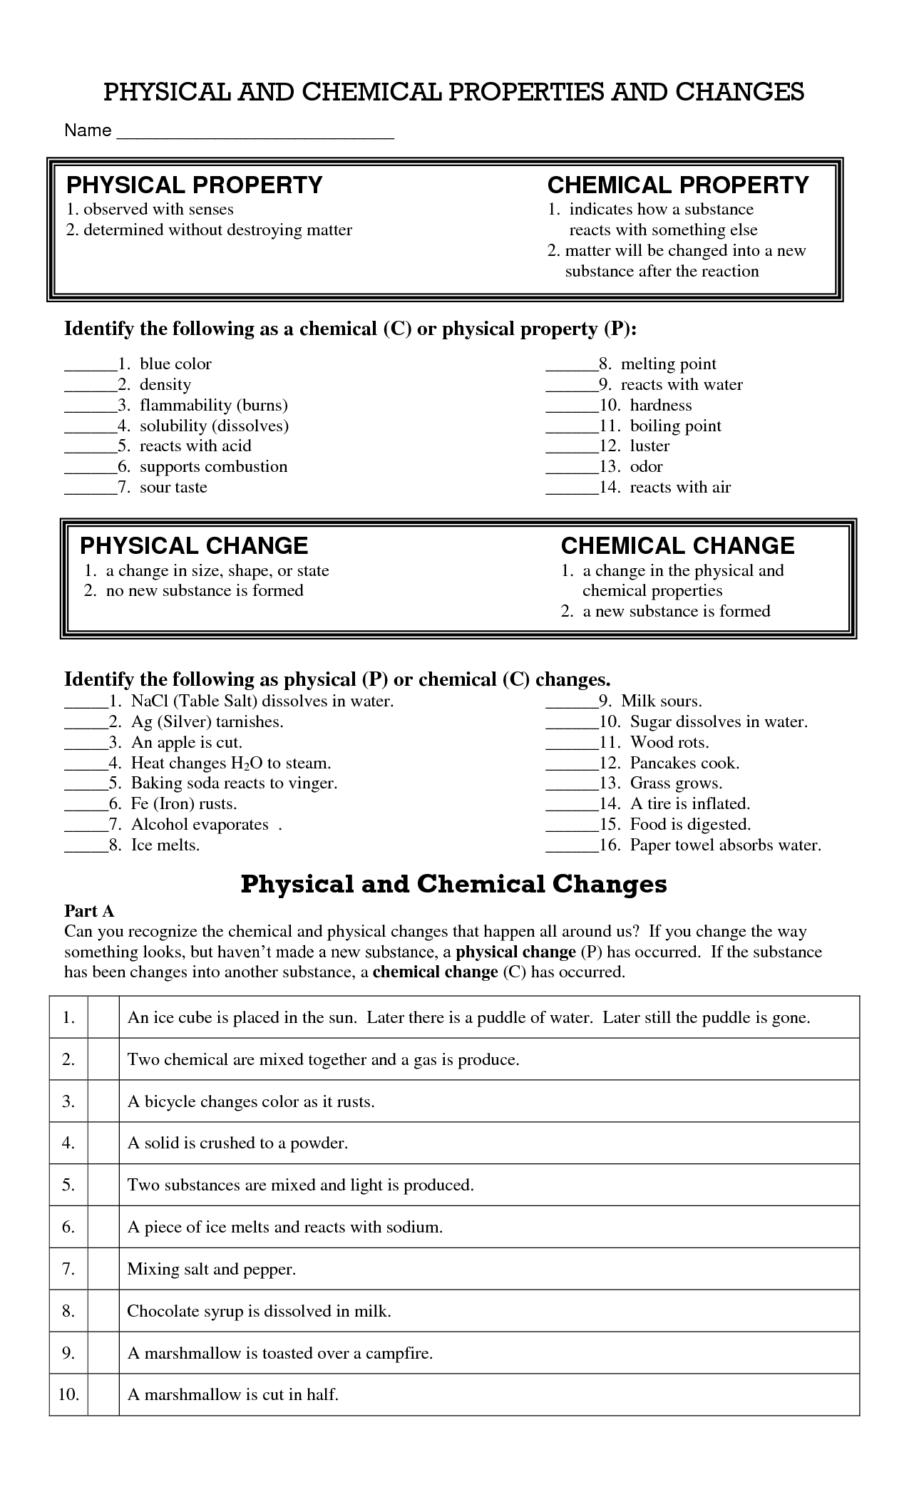 Proficiency W Ksheet Physic L Nd Chemic L Ch Nges Chemic L Nd